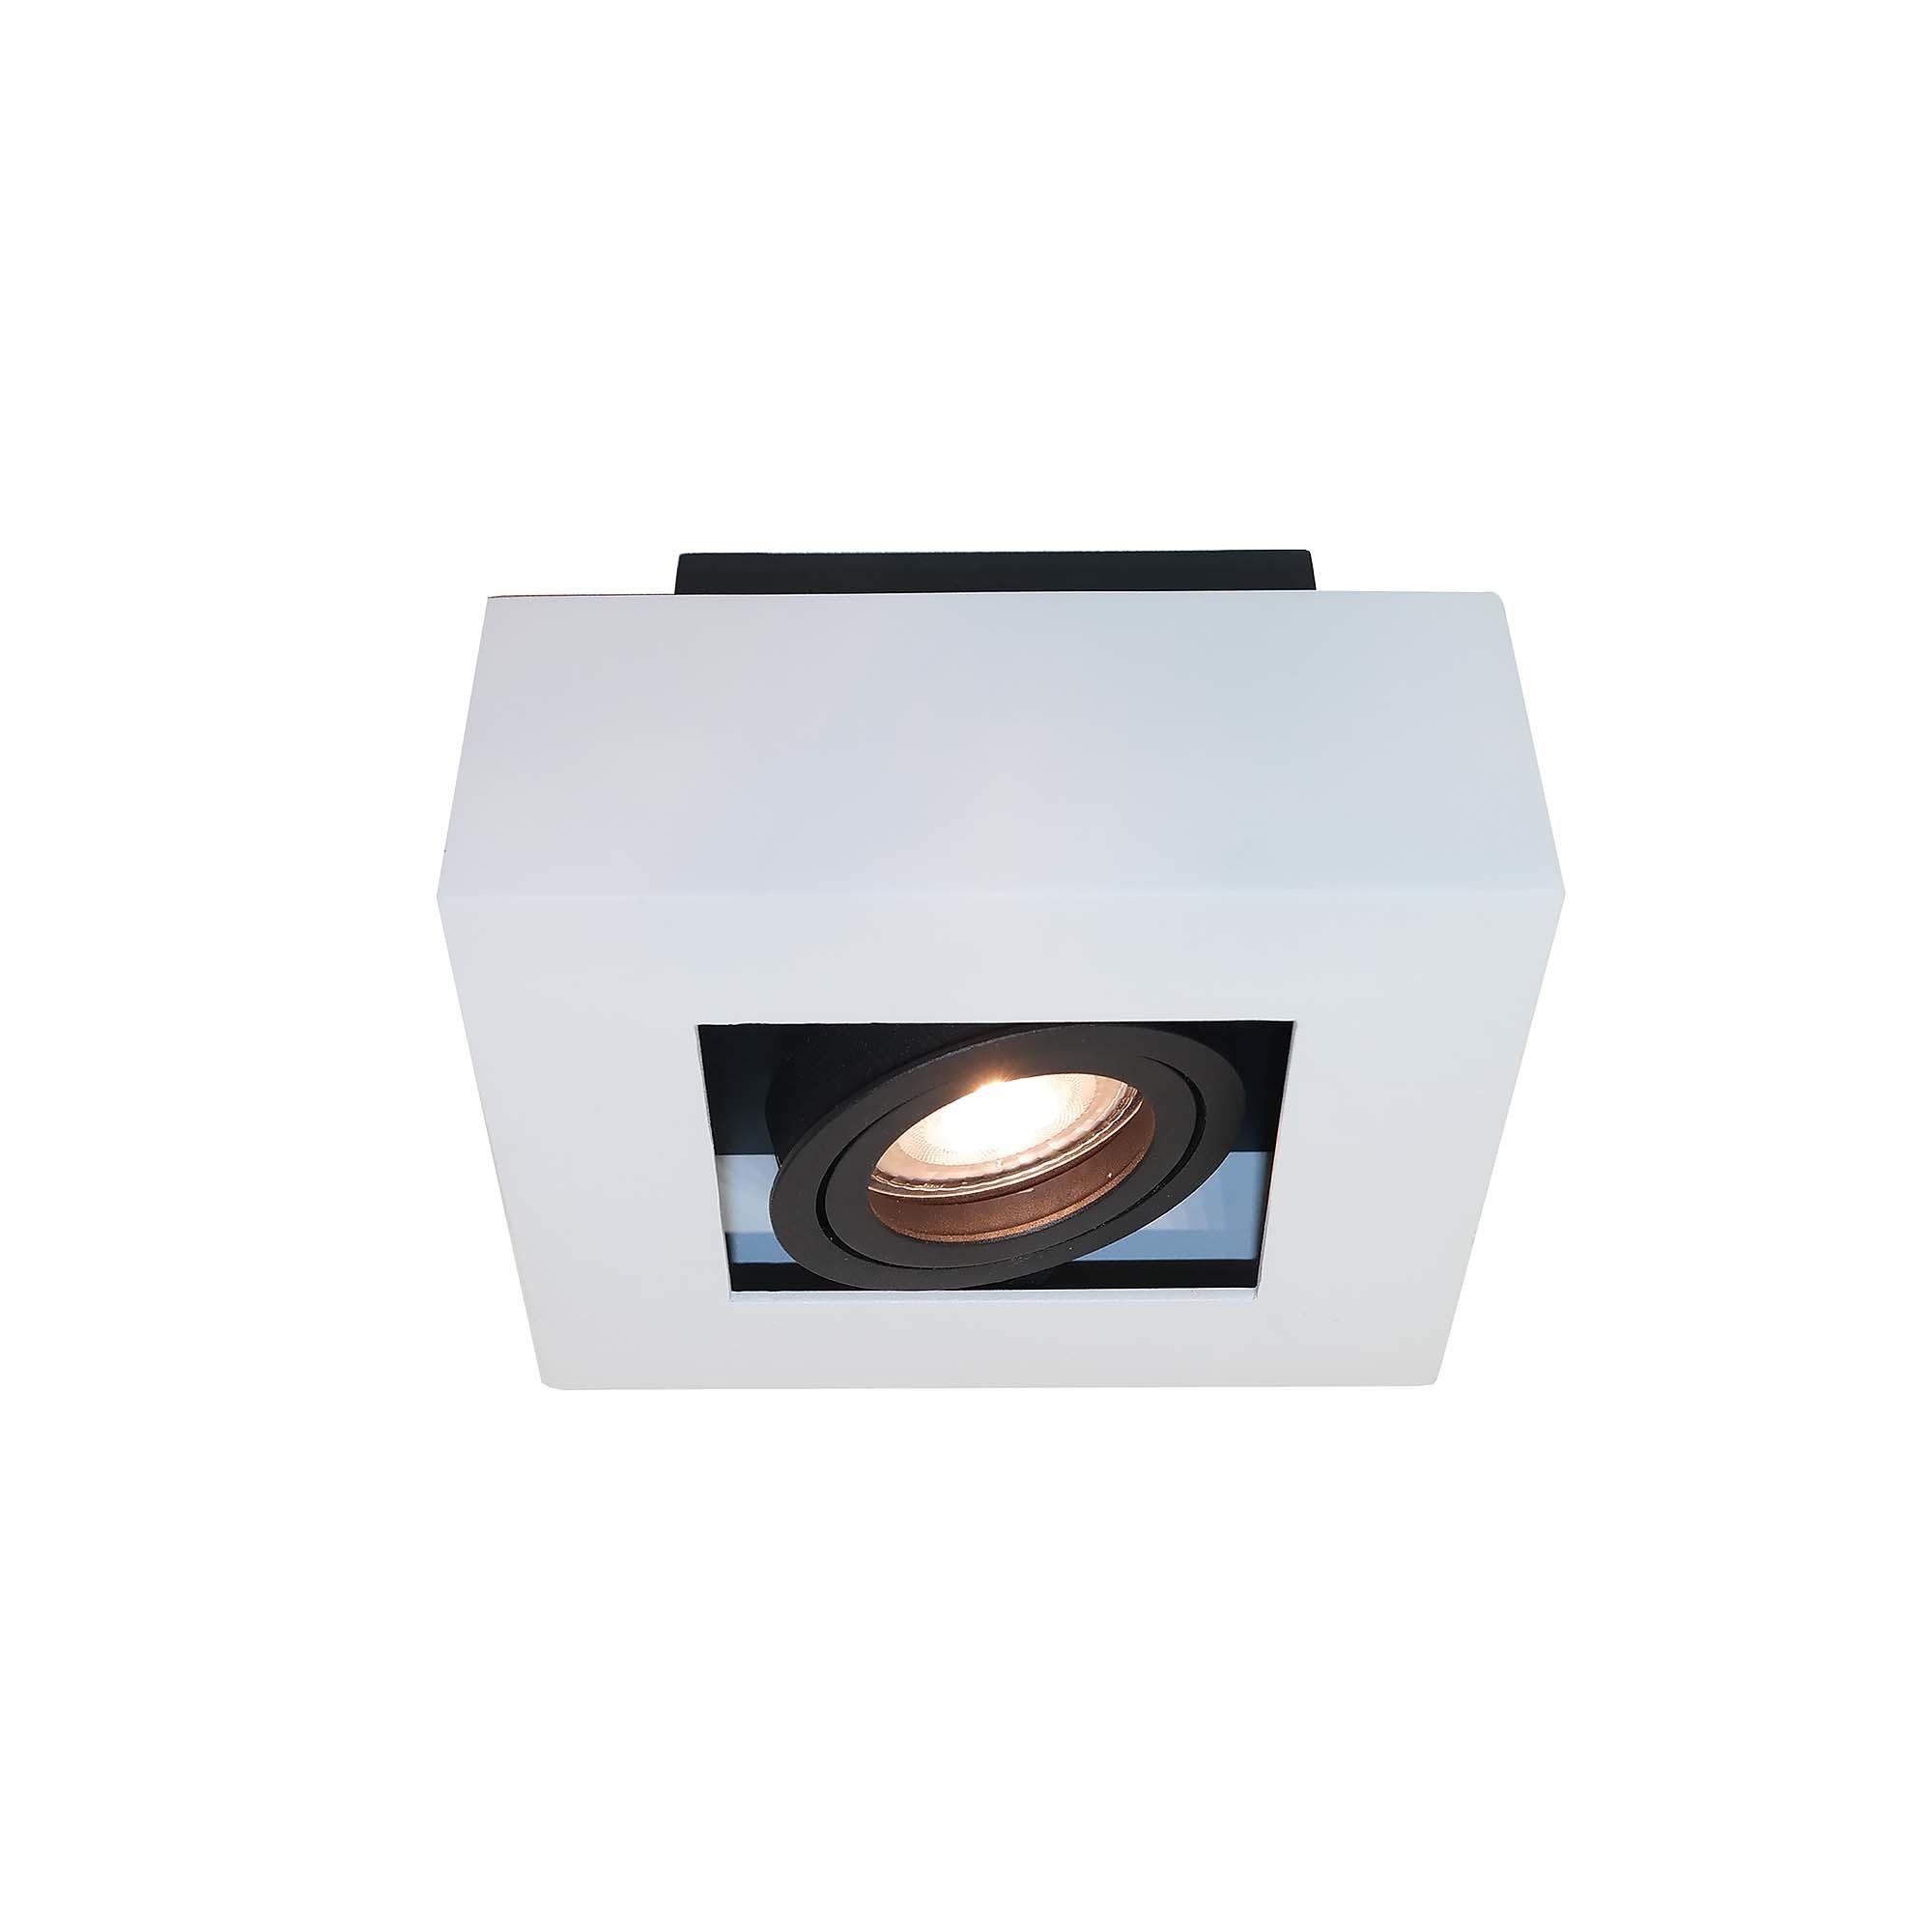 Artdelight Spot Bosco 1 lichts 14 x 14 cm wit-zwart